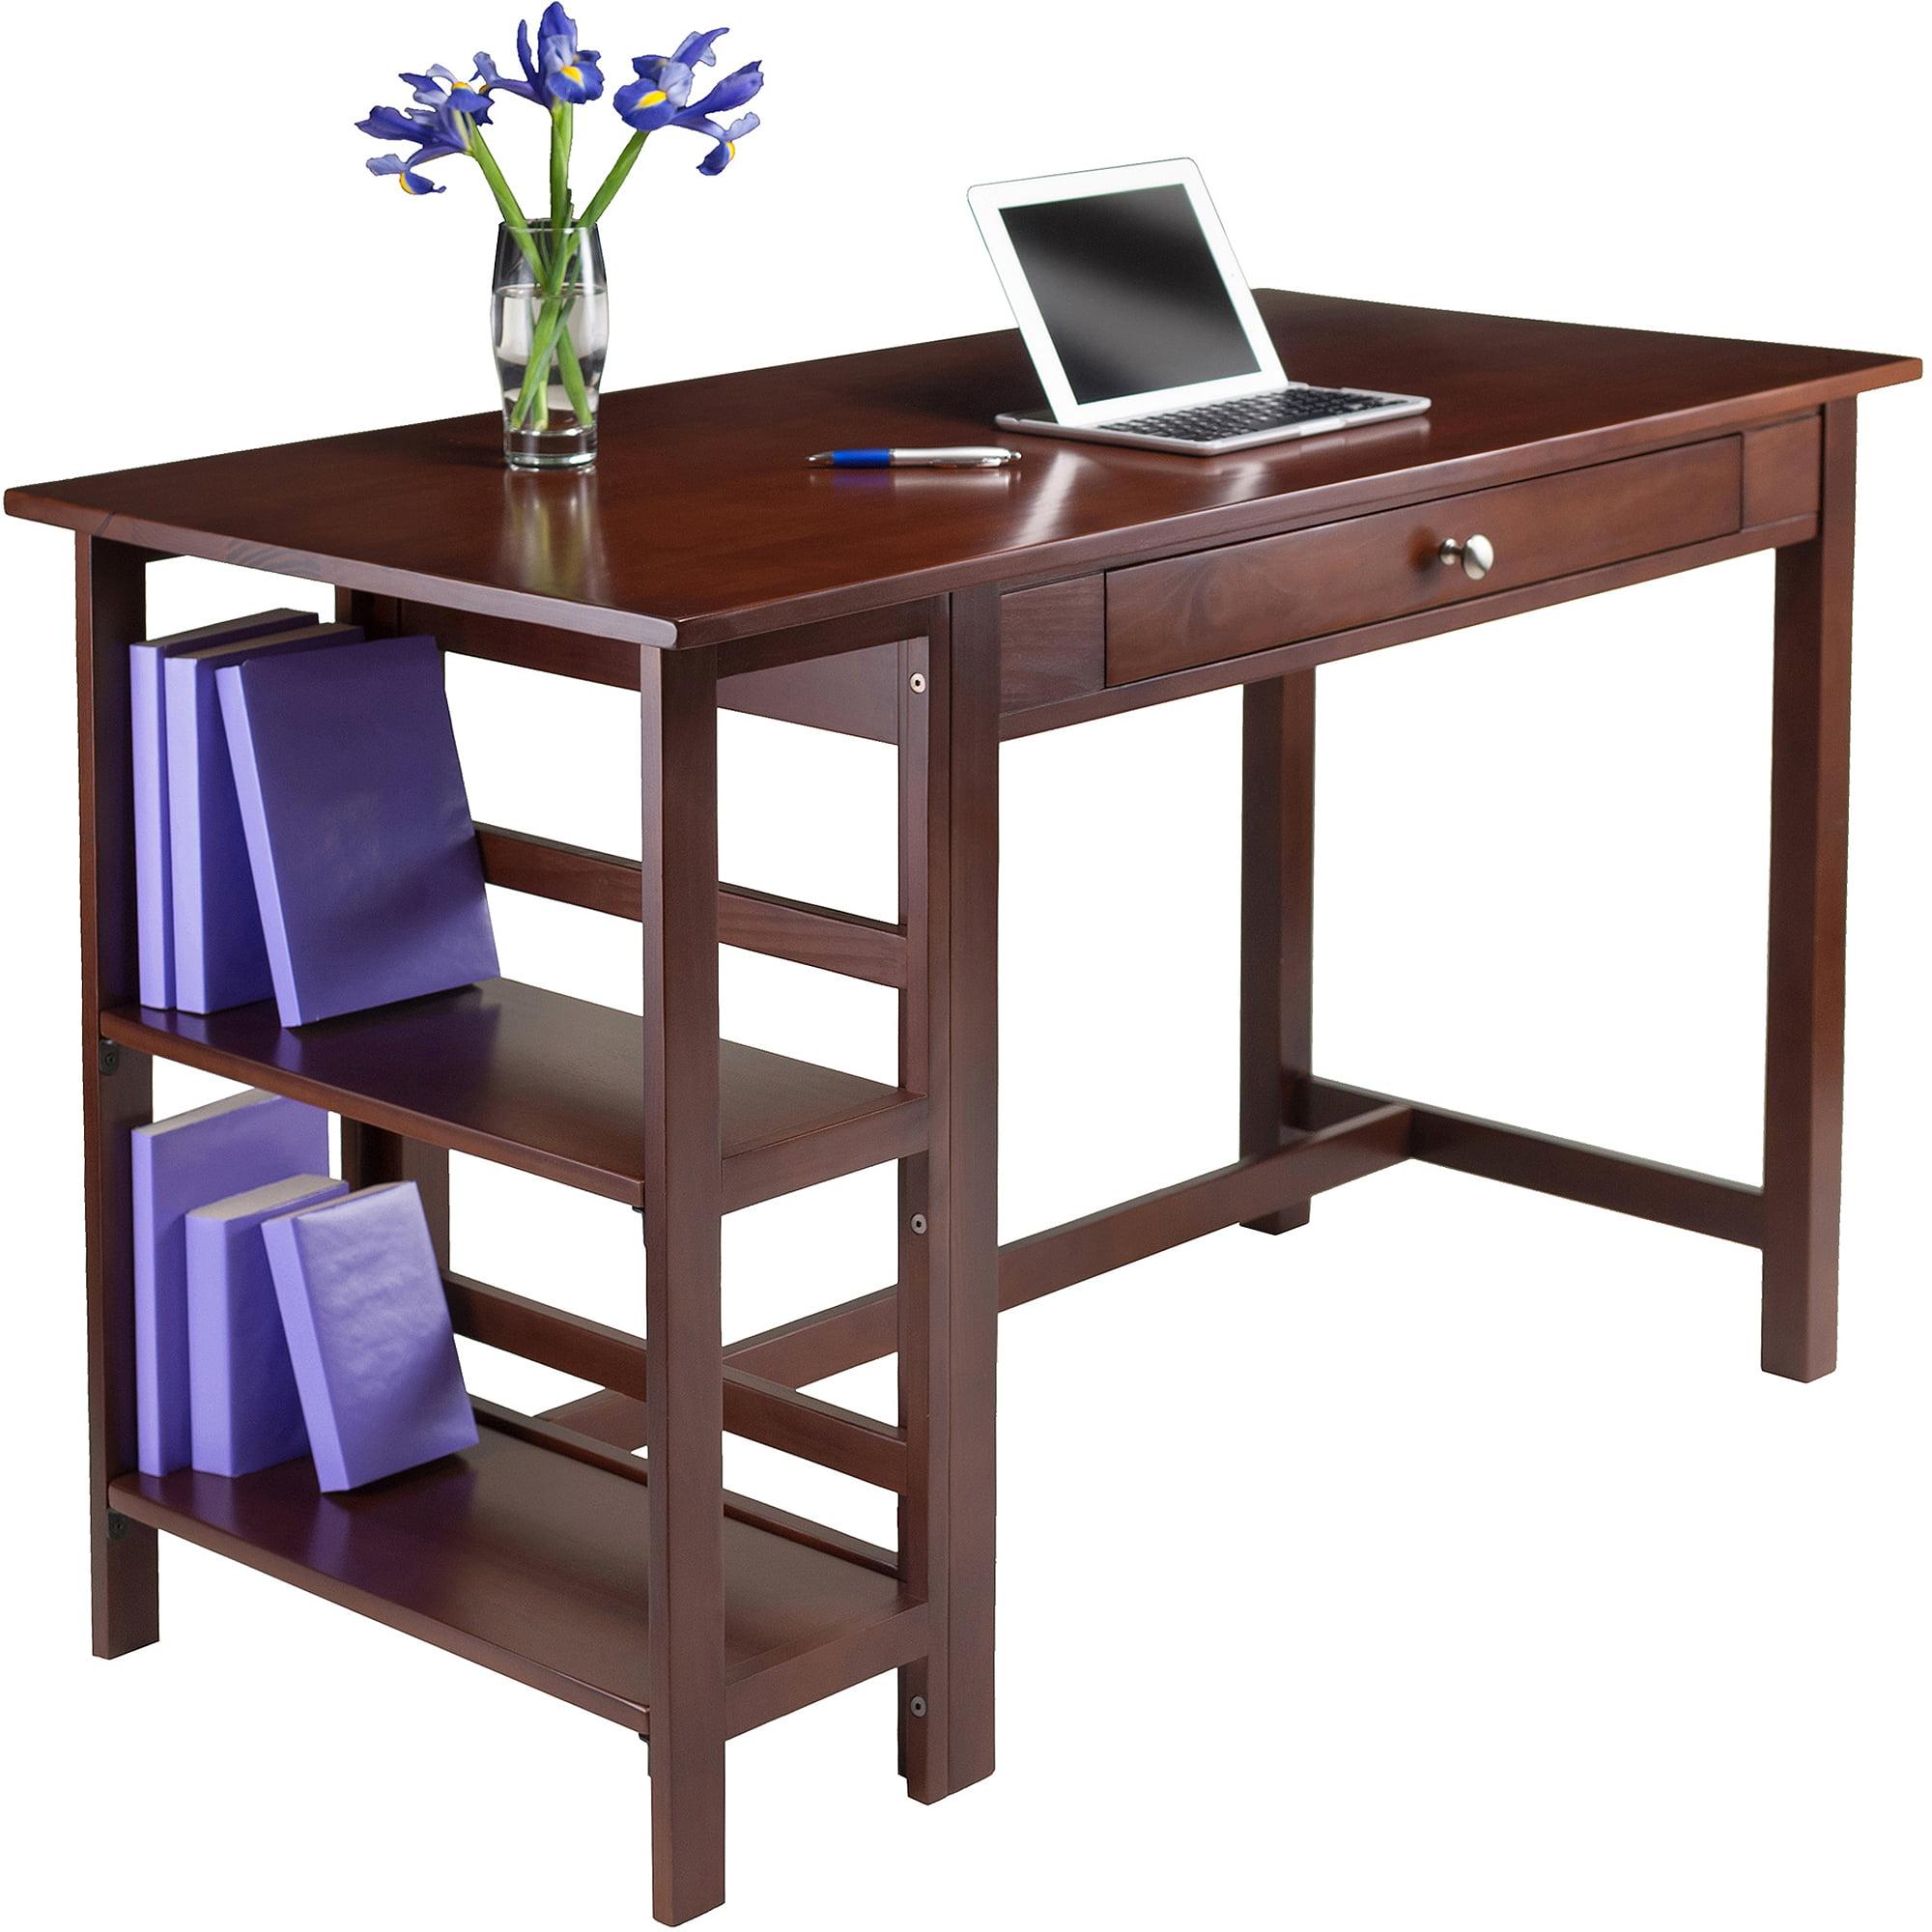 Velda Writing Desk With 2 Shelves, Walnut   Walmart.com